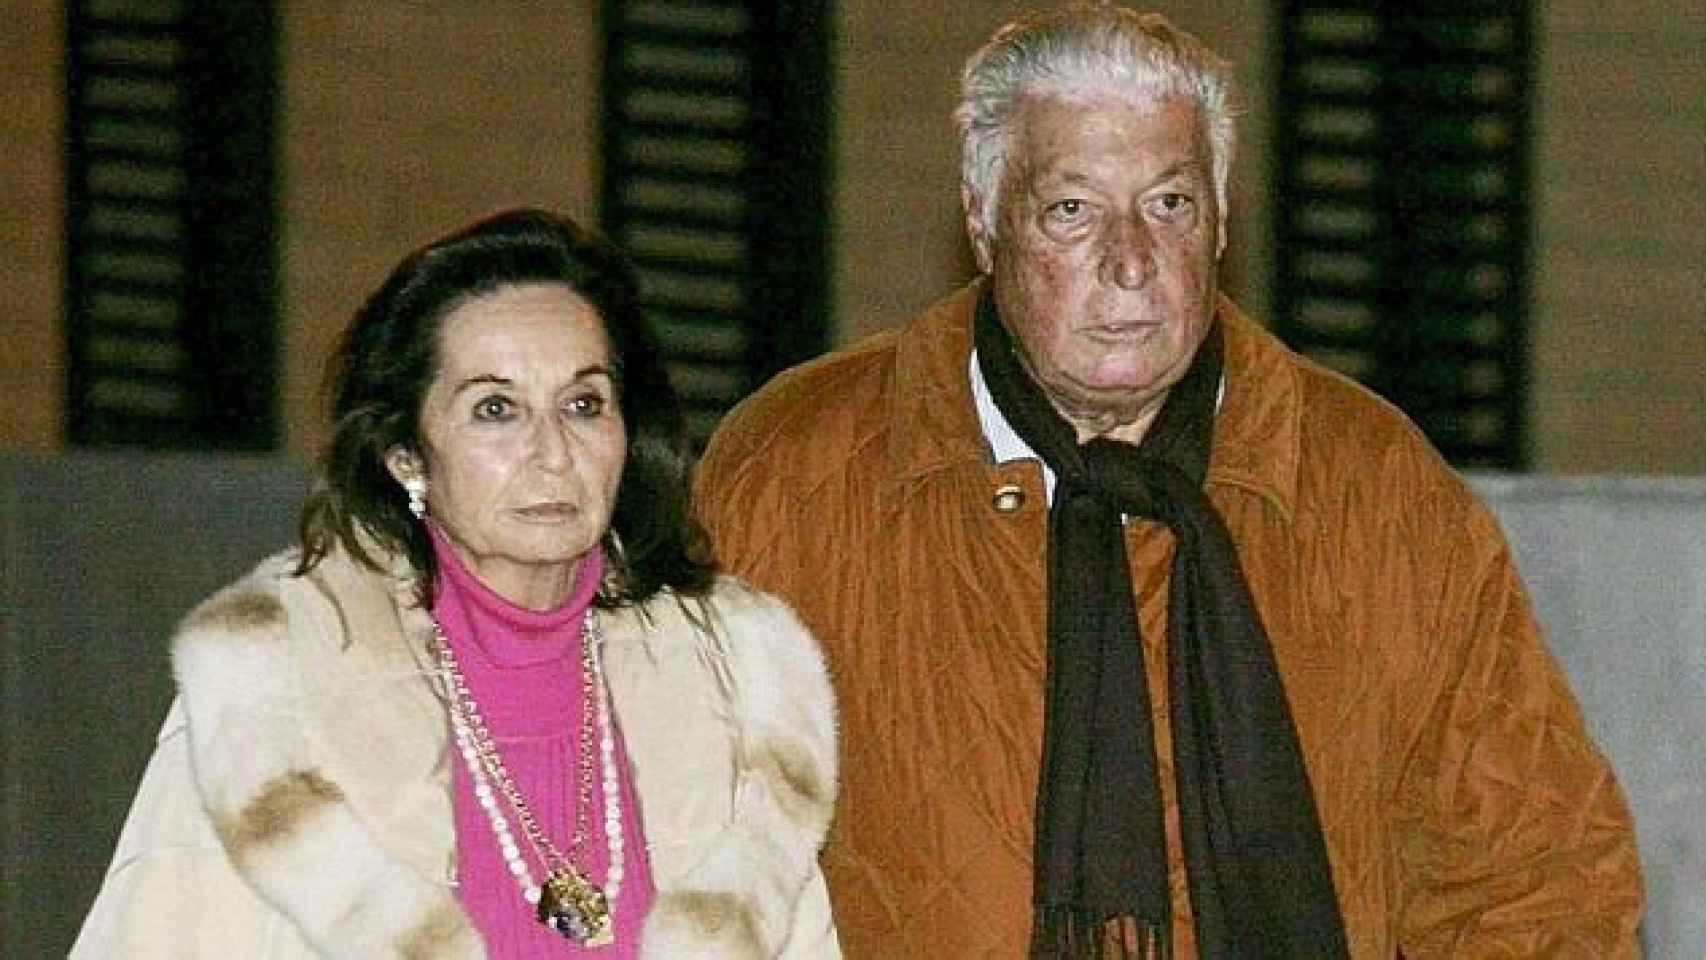 Doris Malfeito acompaña a su marido, Macià Alavedra, a la salida de Can Brians